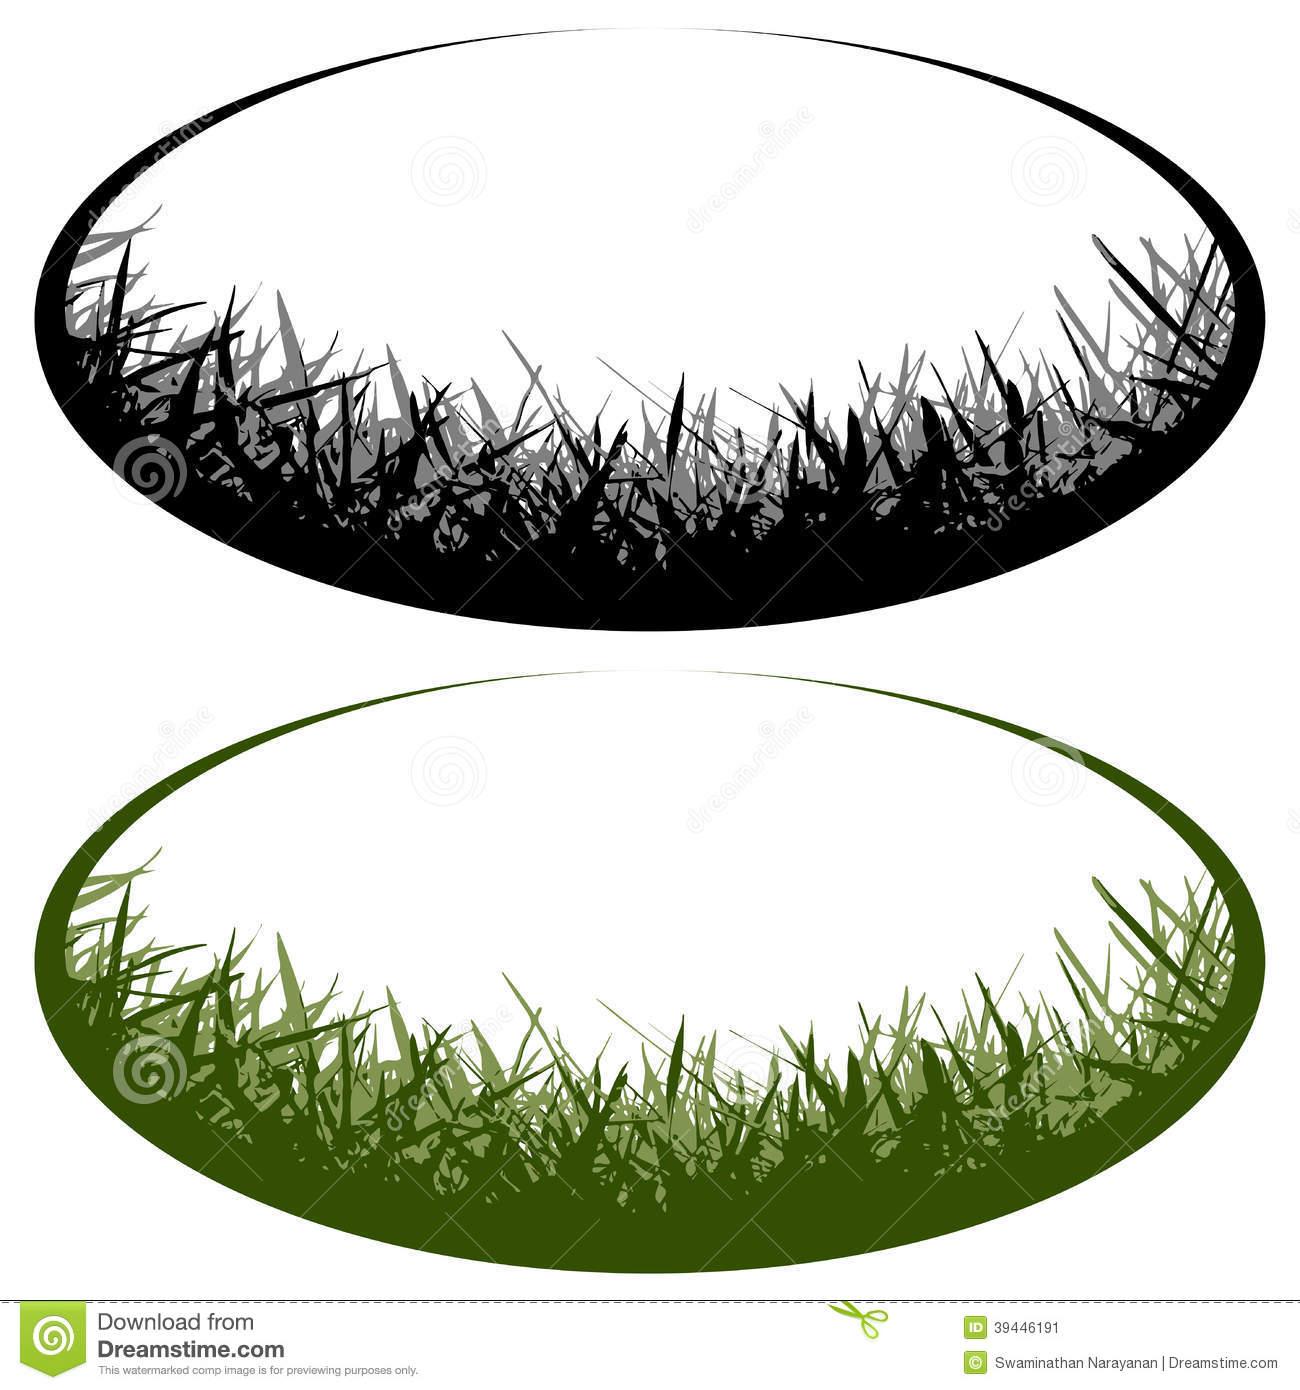 Grass-Cutting Logos